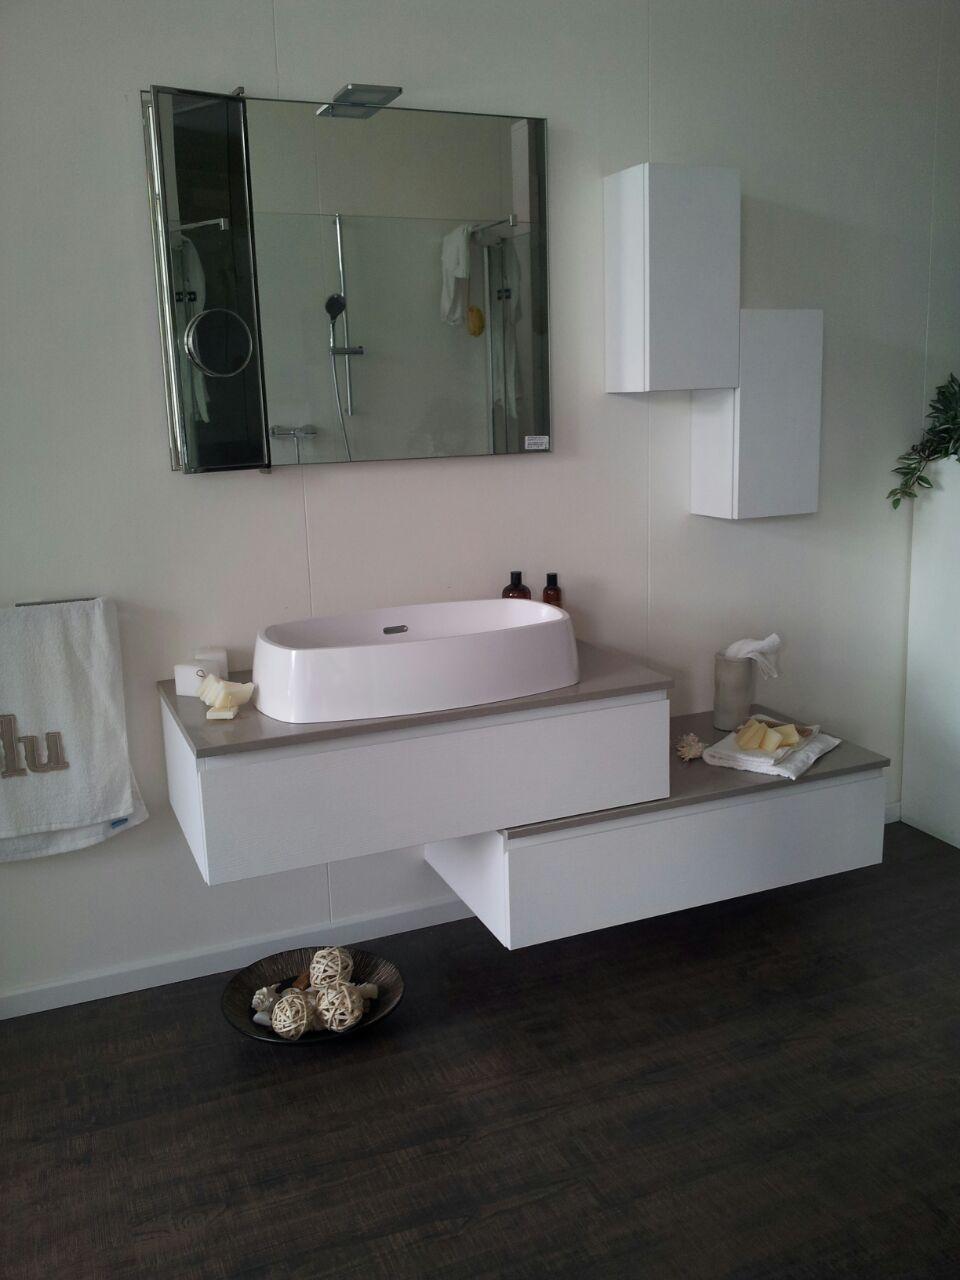 Scavolini scavolini mod rivo design arredo bagno a - Arredo bagno scavolini prezzi ...